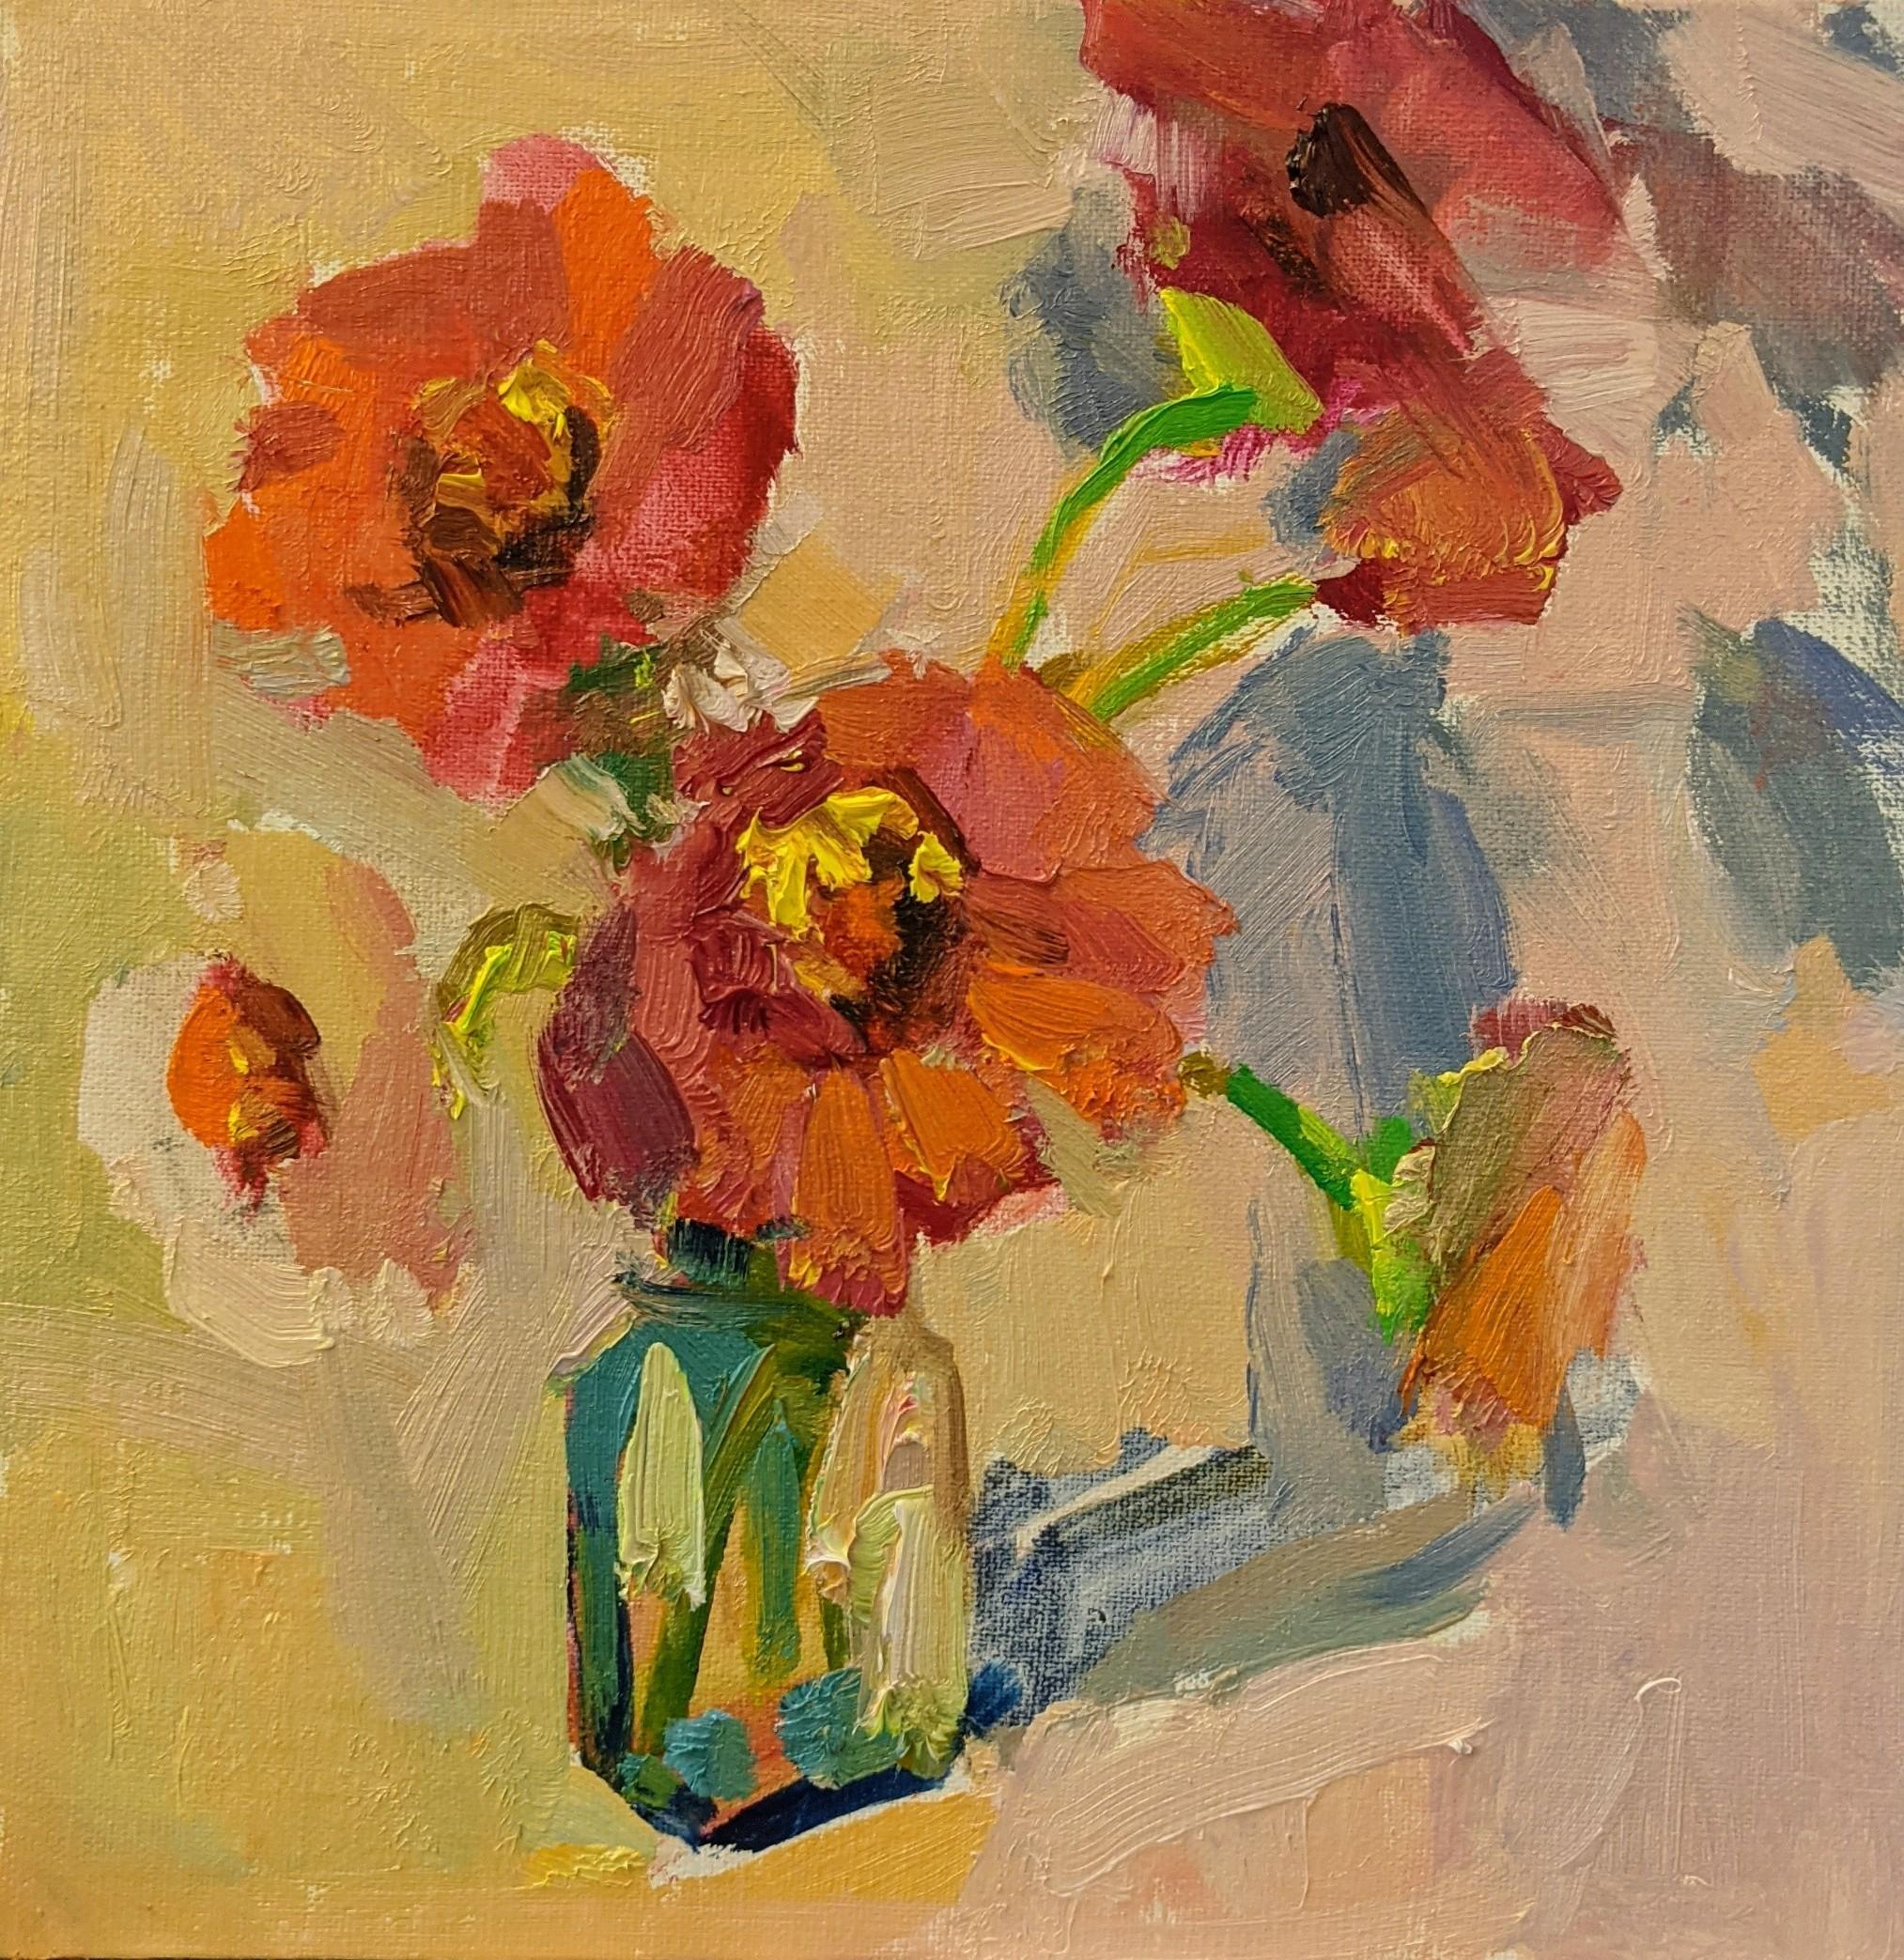 Fleurs I by Millie Gosch, Small Framed Oil on Board Still-Life Painting